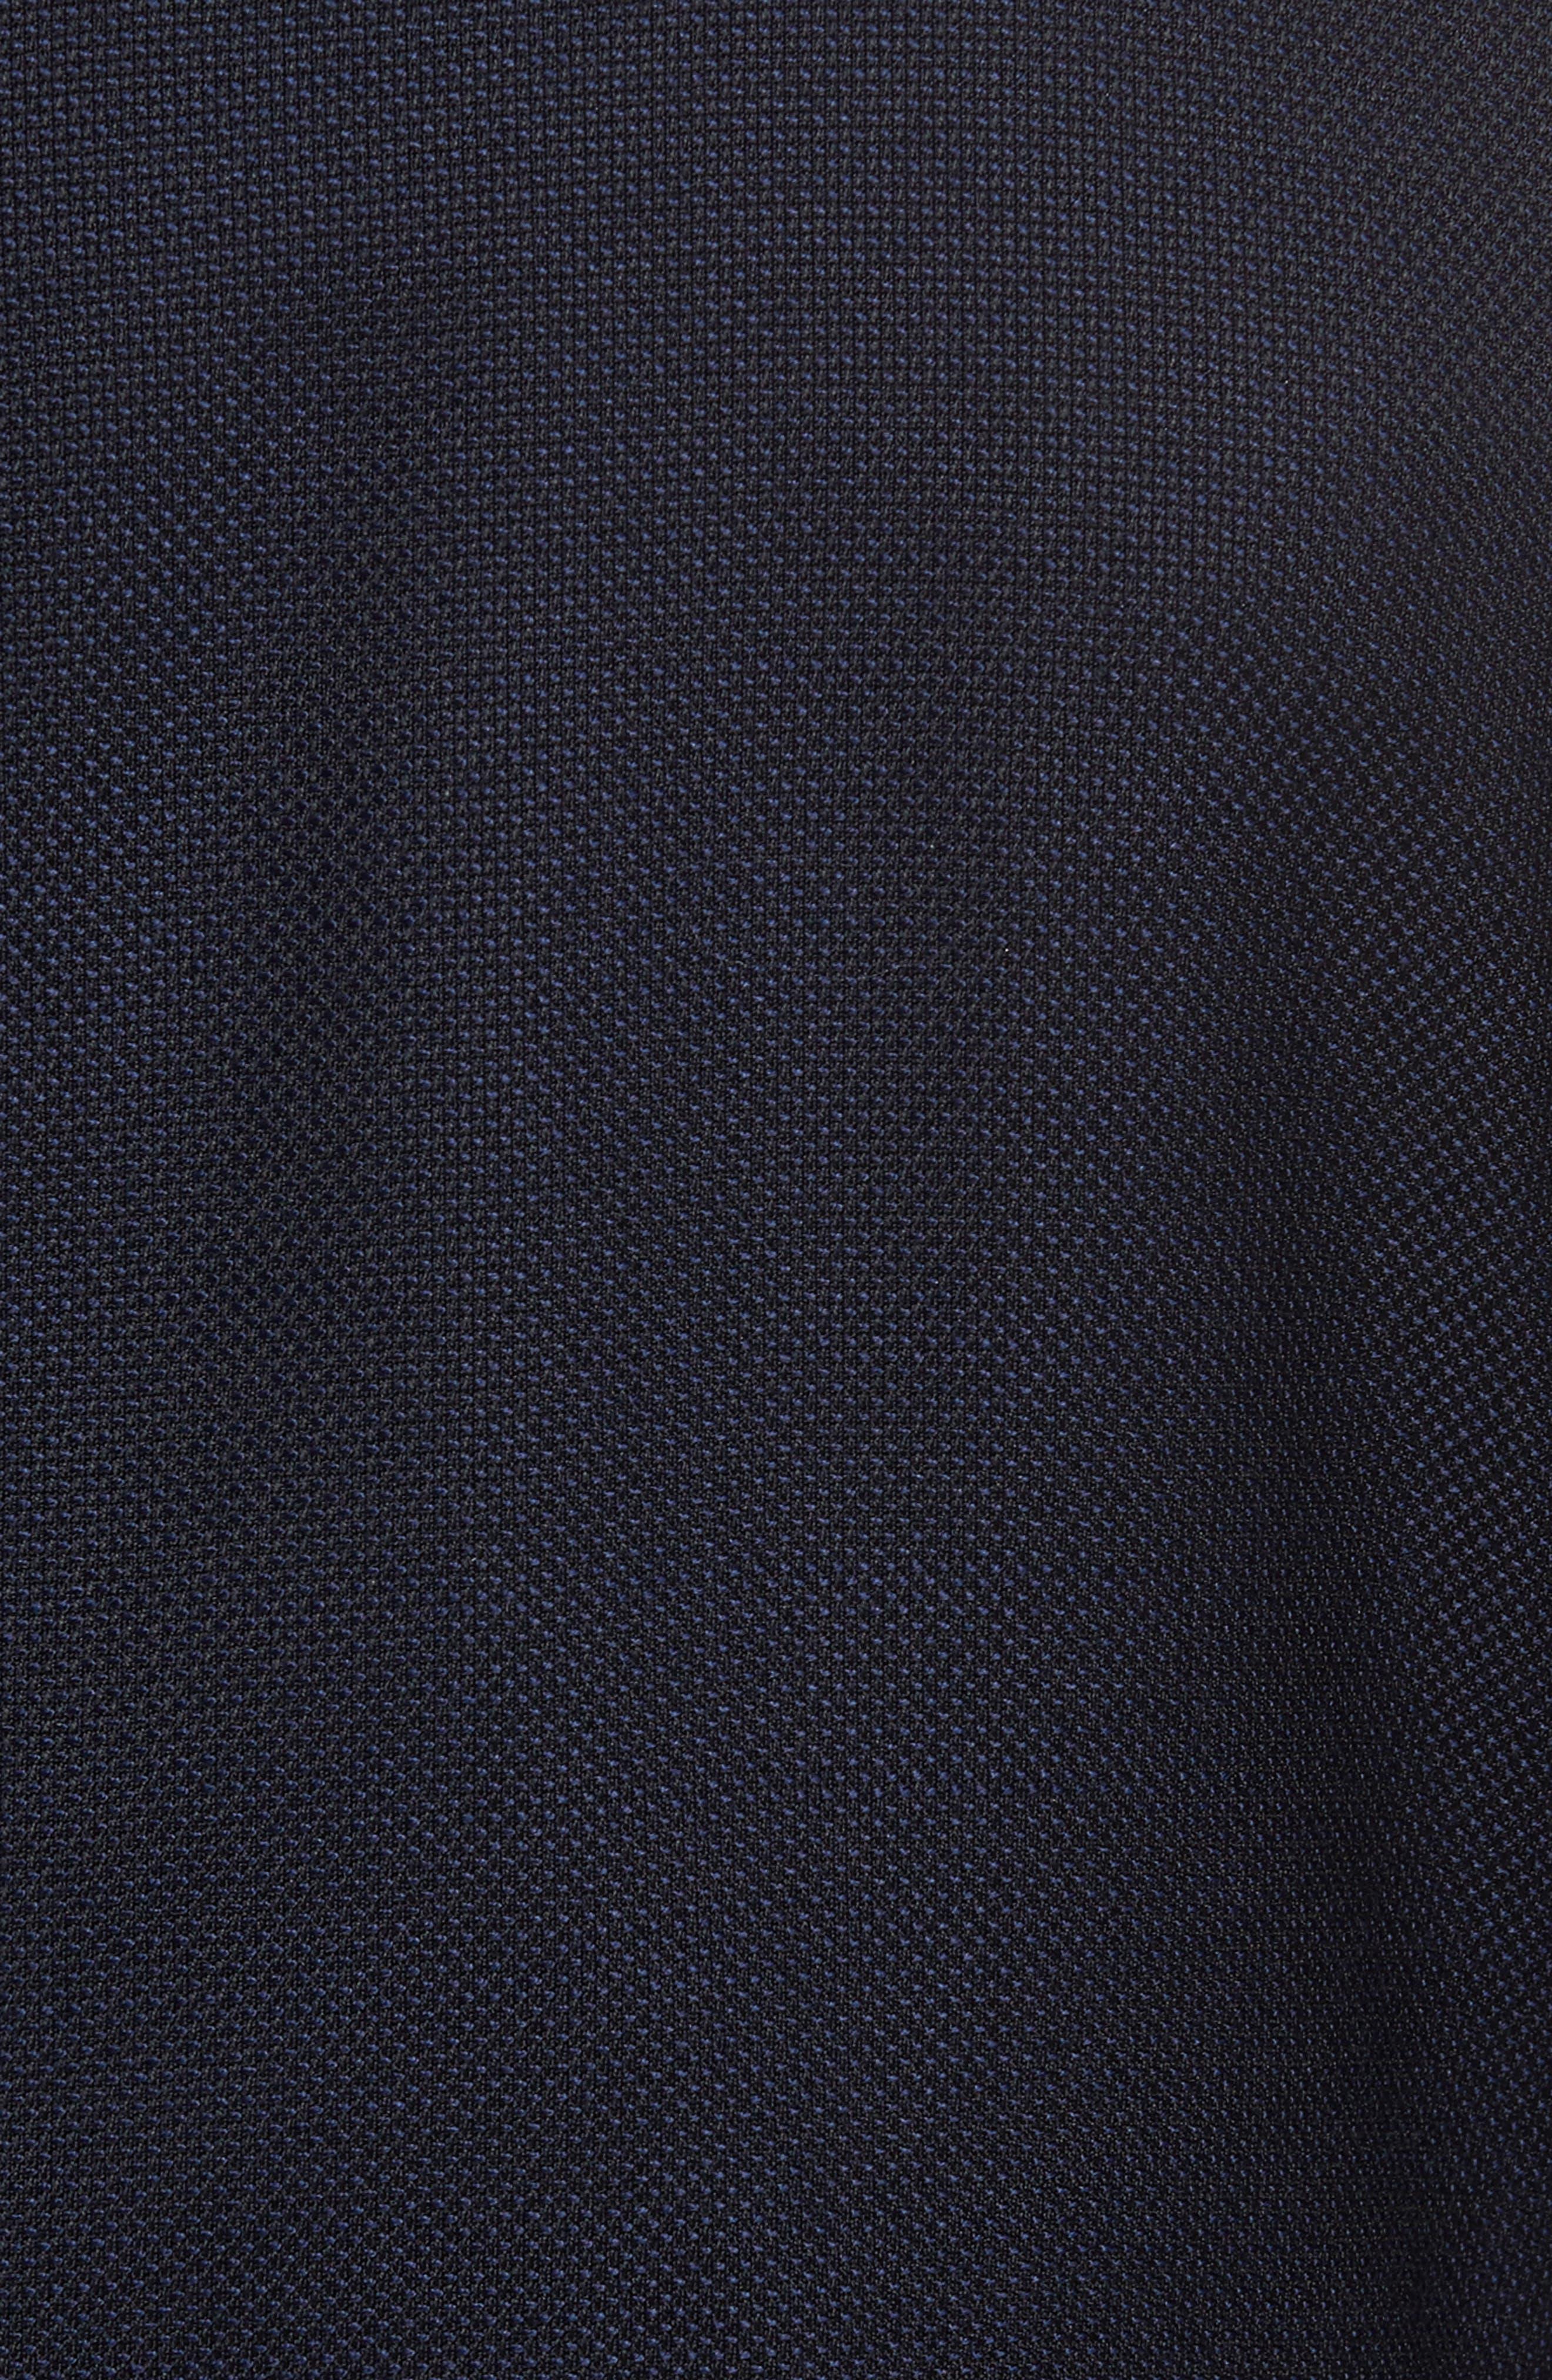 Vantage Trim Fit Wool Blazer,                             Alternate thumbnail 6, color,